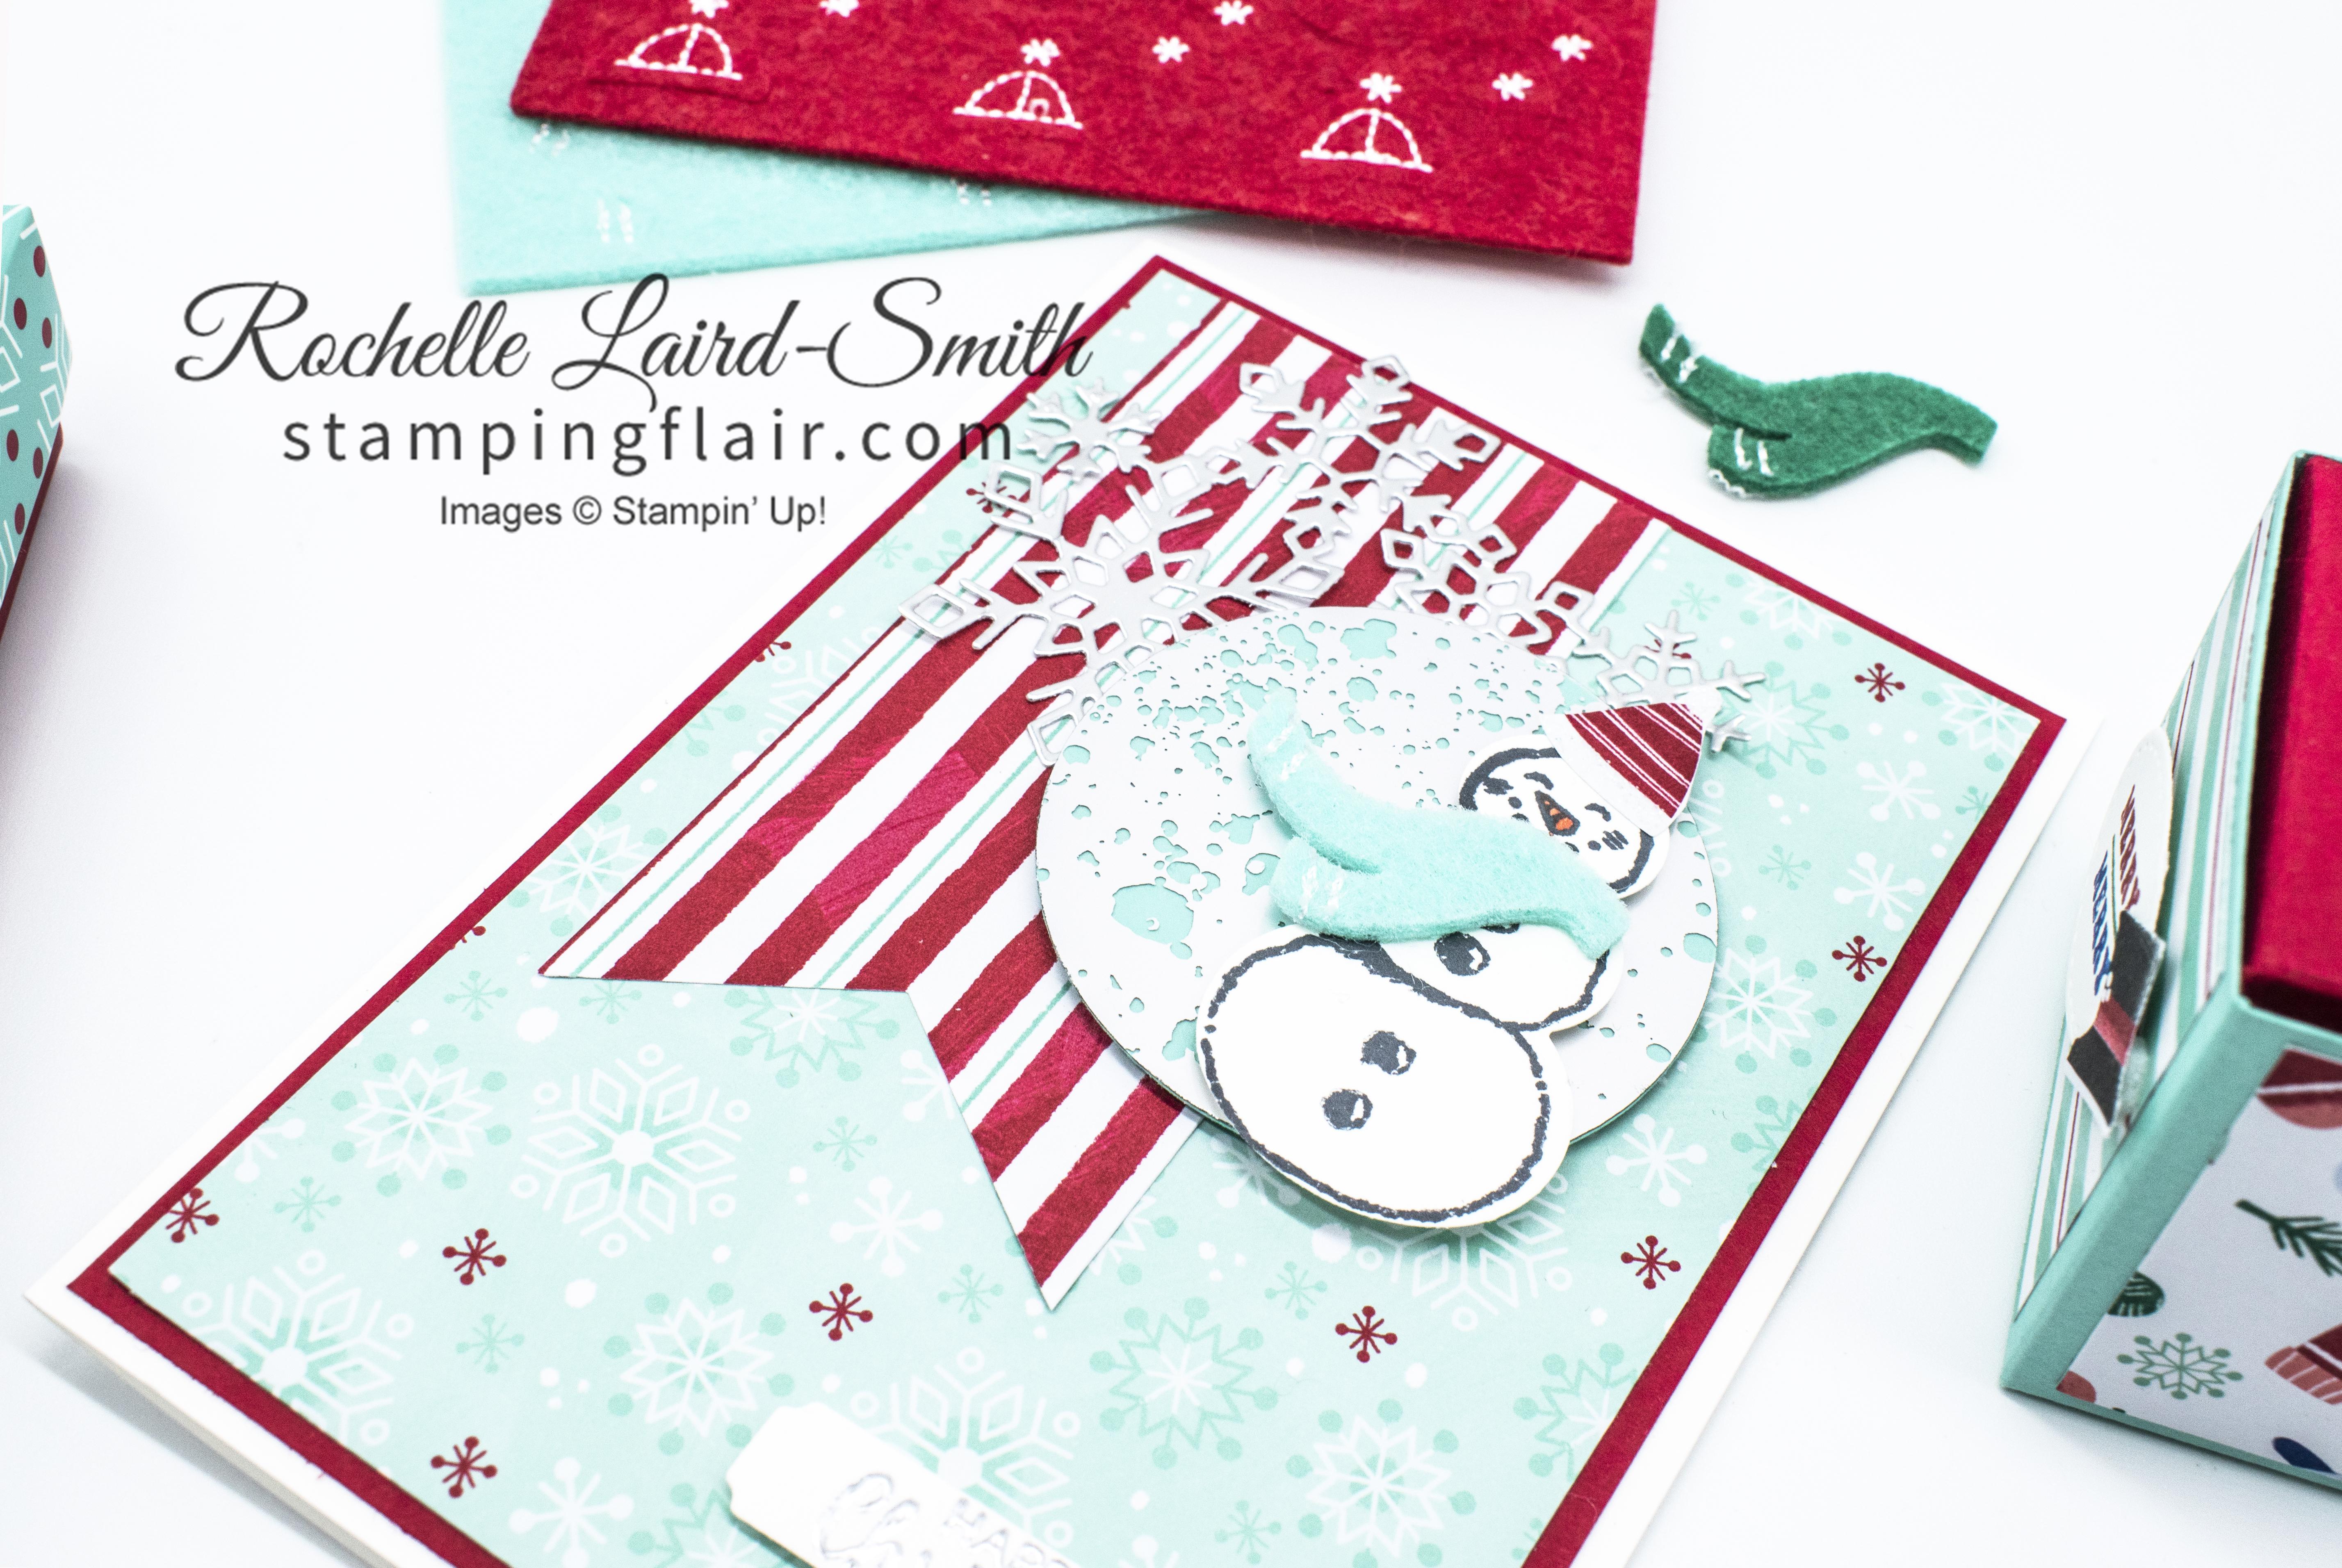 Esad 2019 Holiday Catalogue Sneak Peek Blog Hop - Stamping Flair